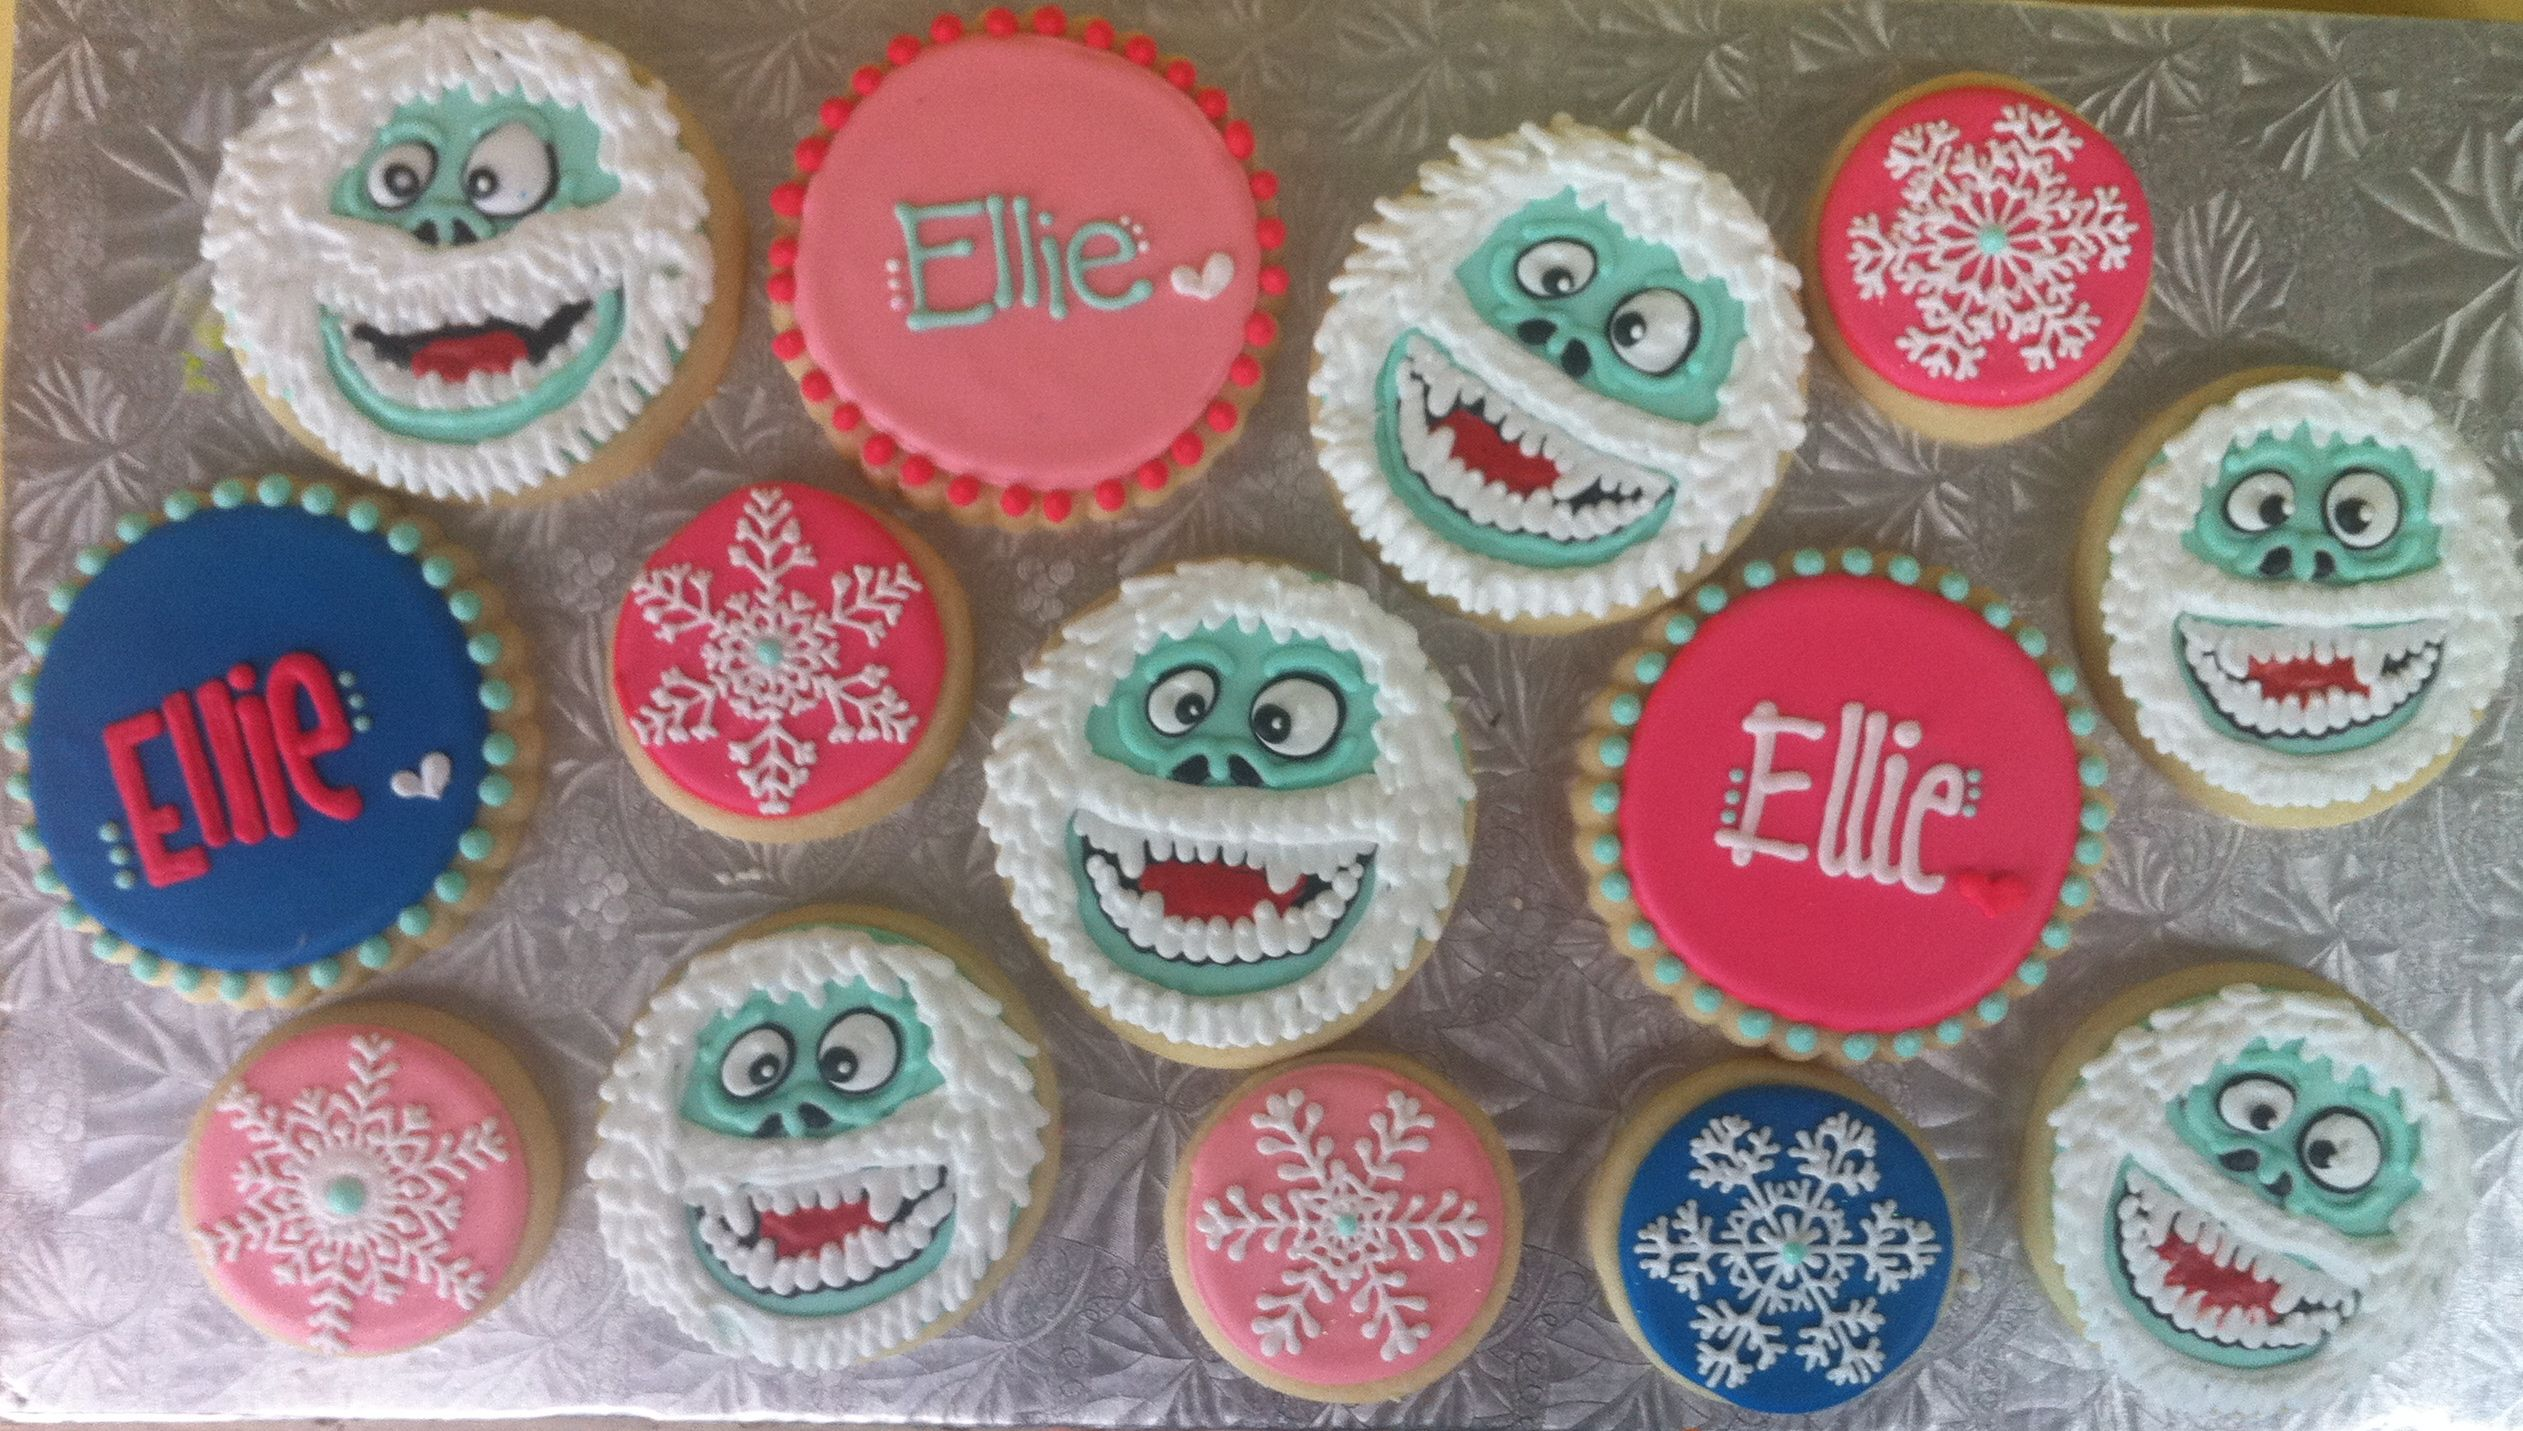 Abominable Snowman Cookie Set Xoxooxoxo My Cookies Hayleycakes